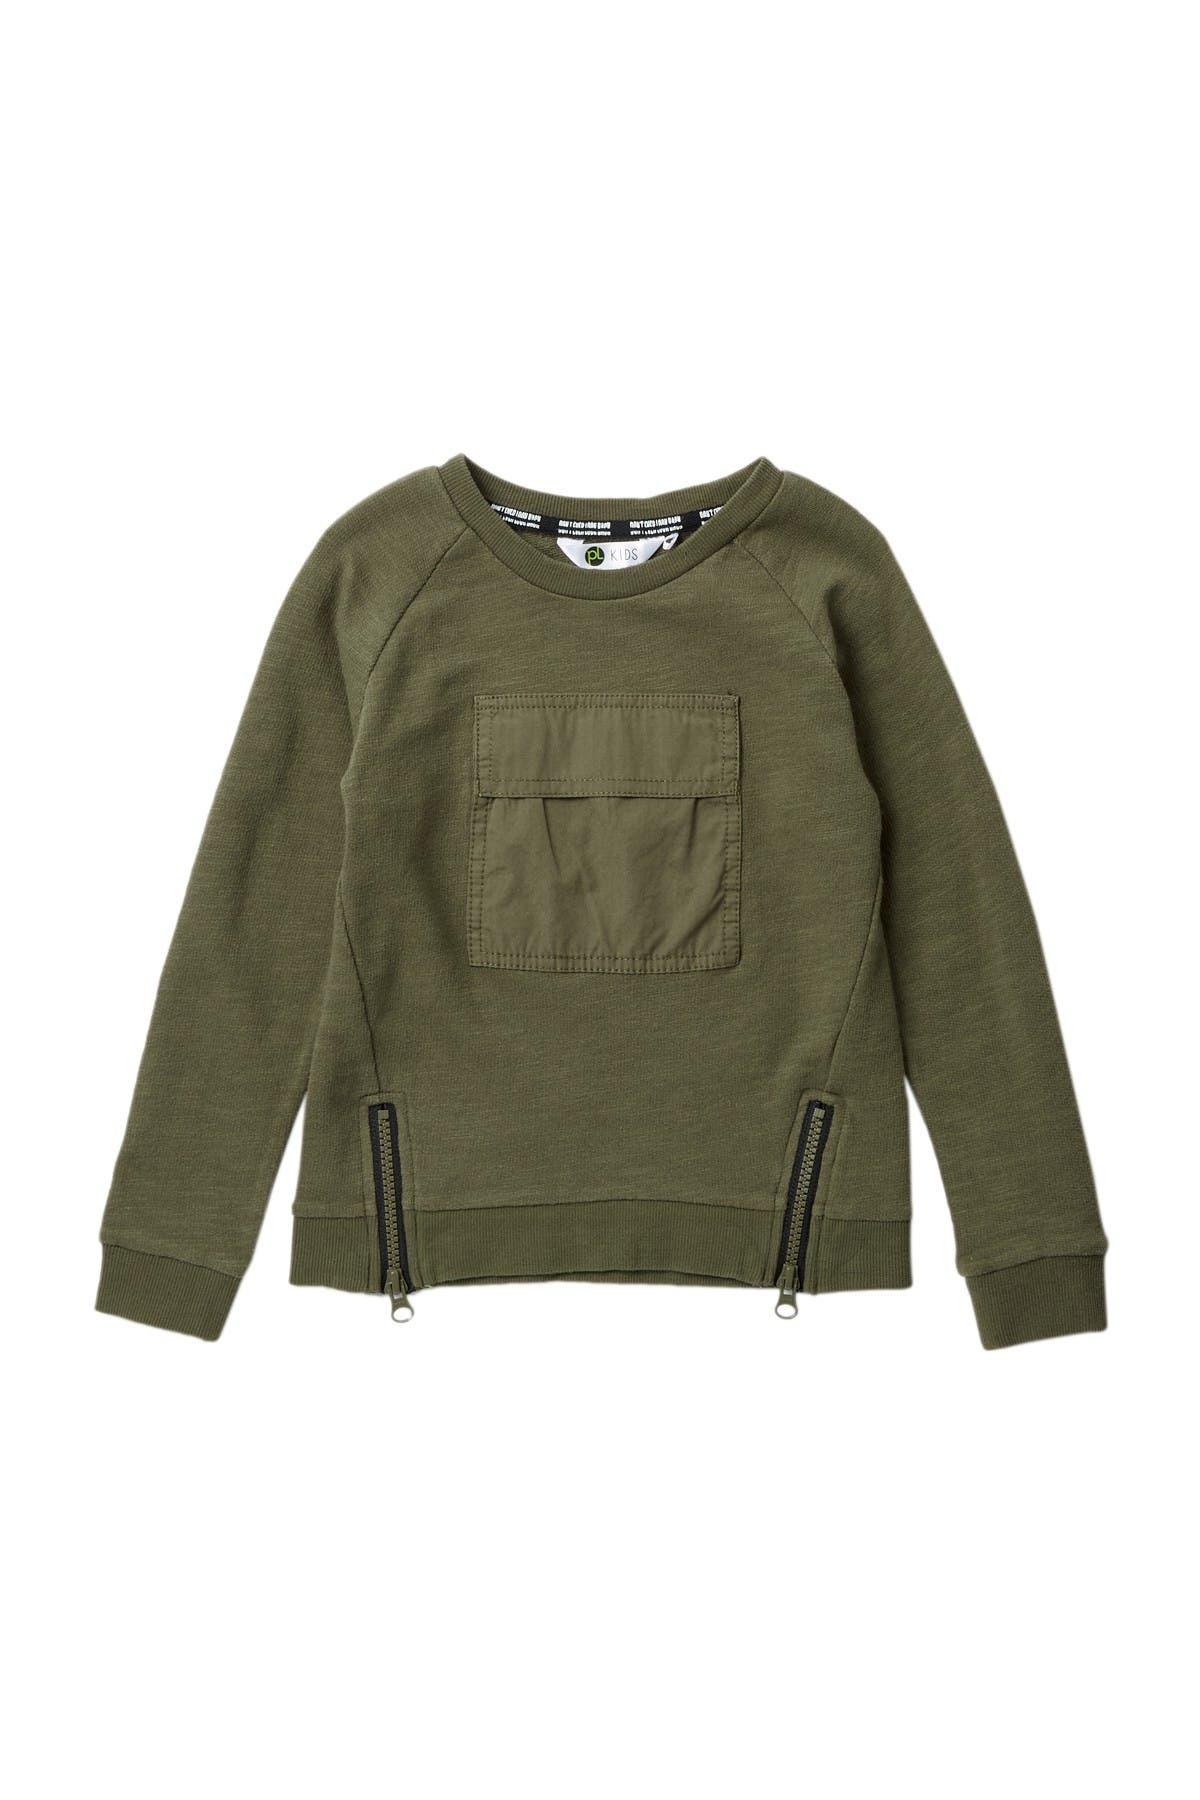 Image of Petit Lem Zip Sweatshirt